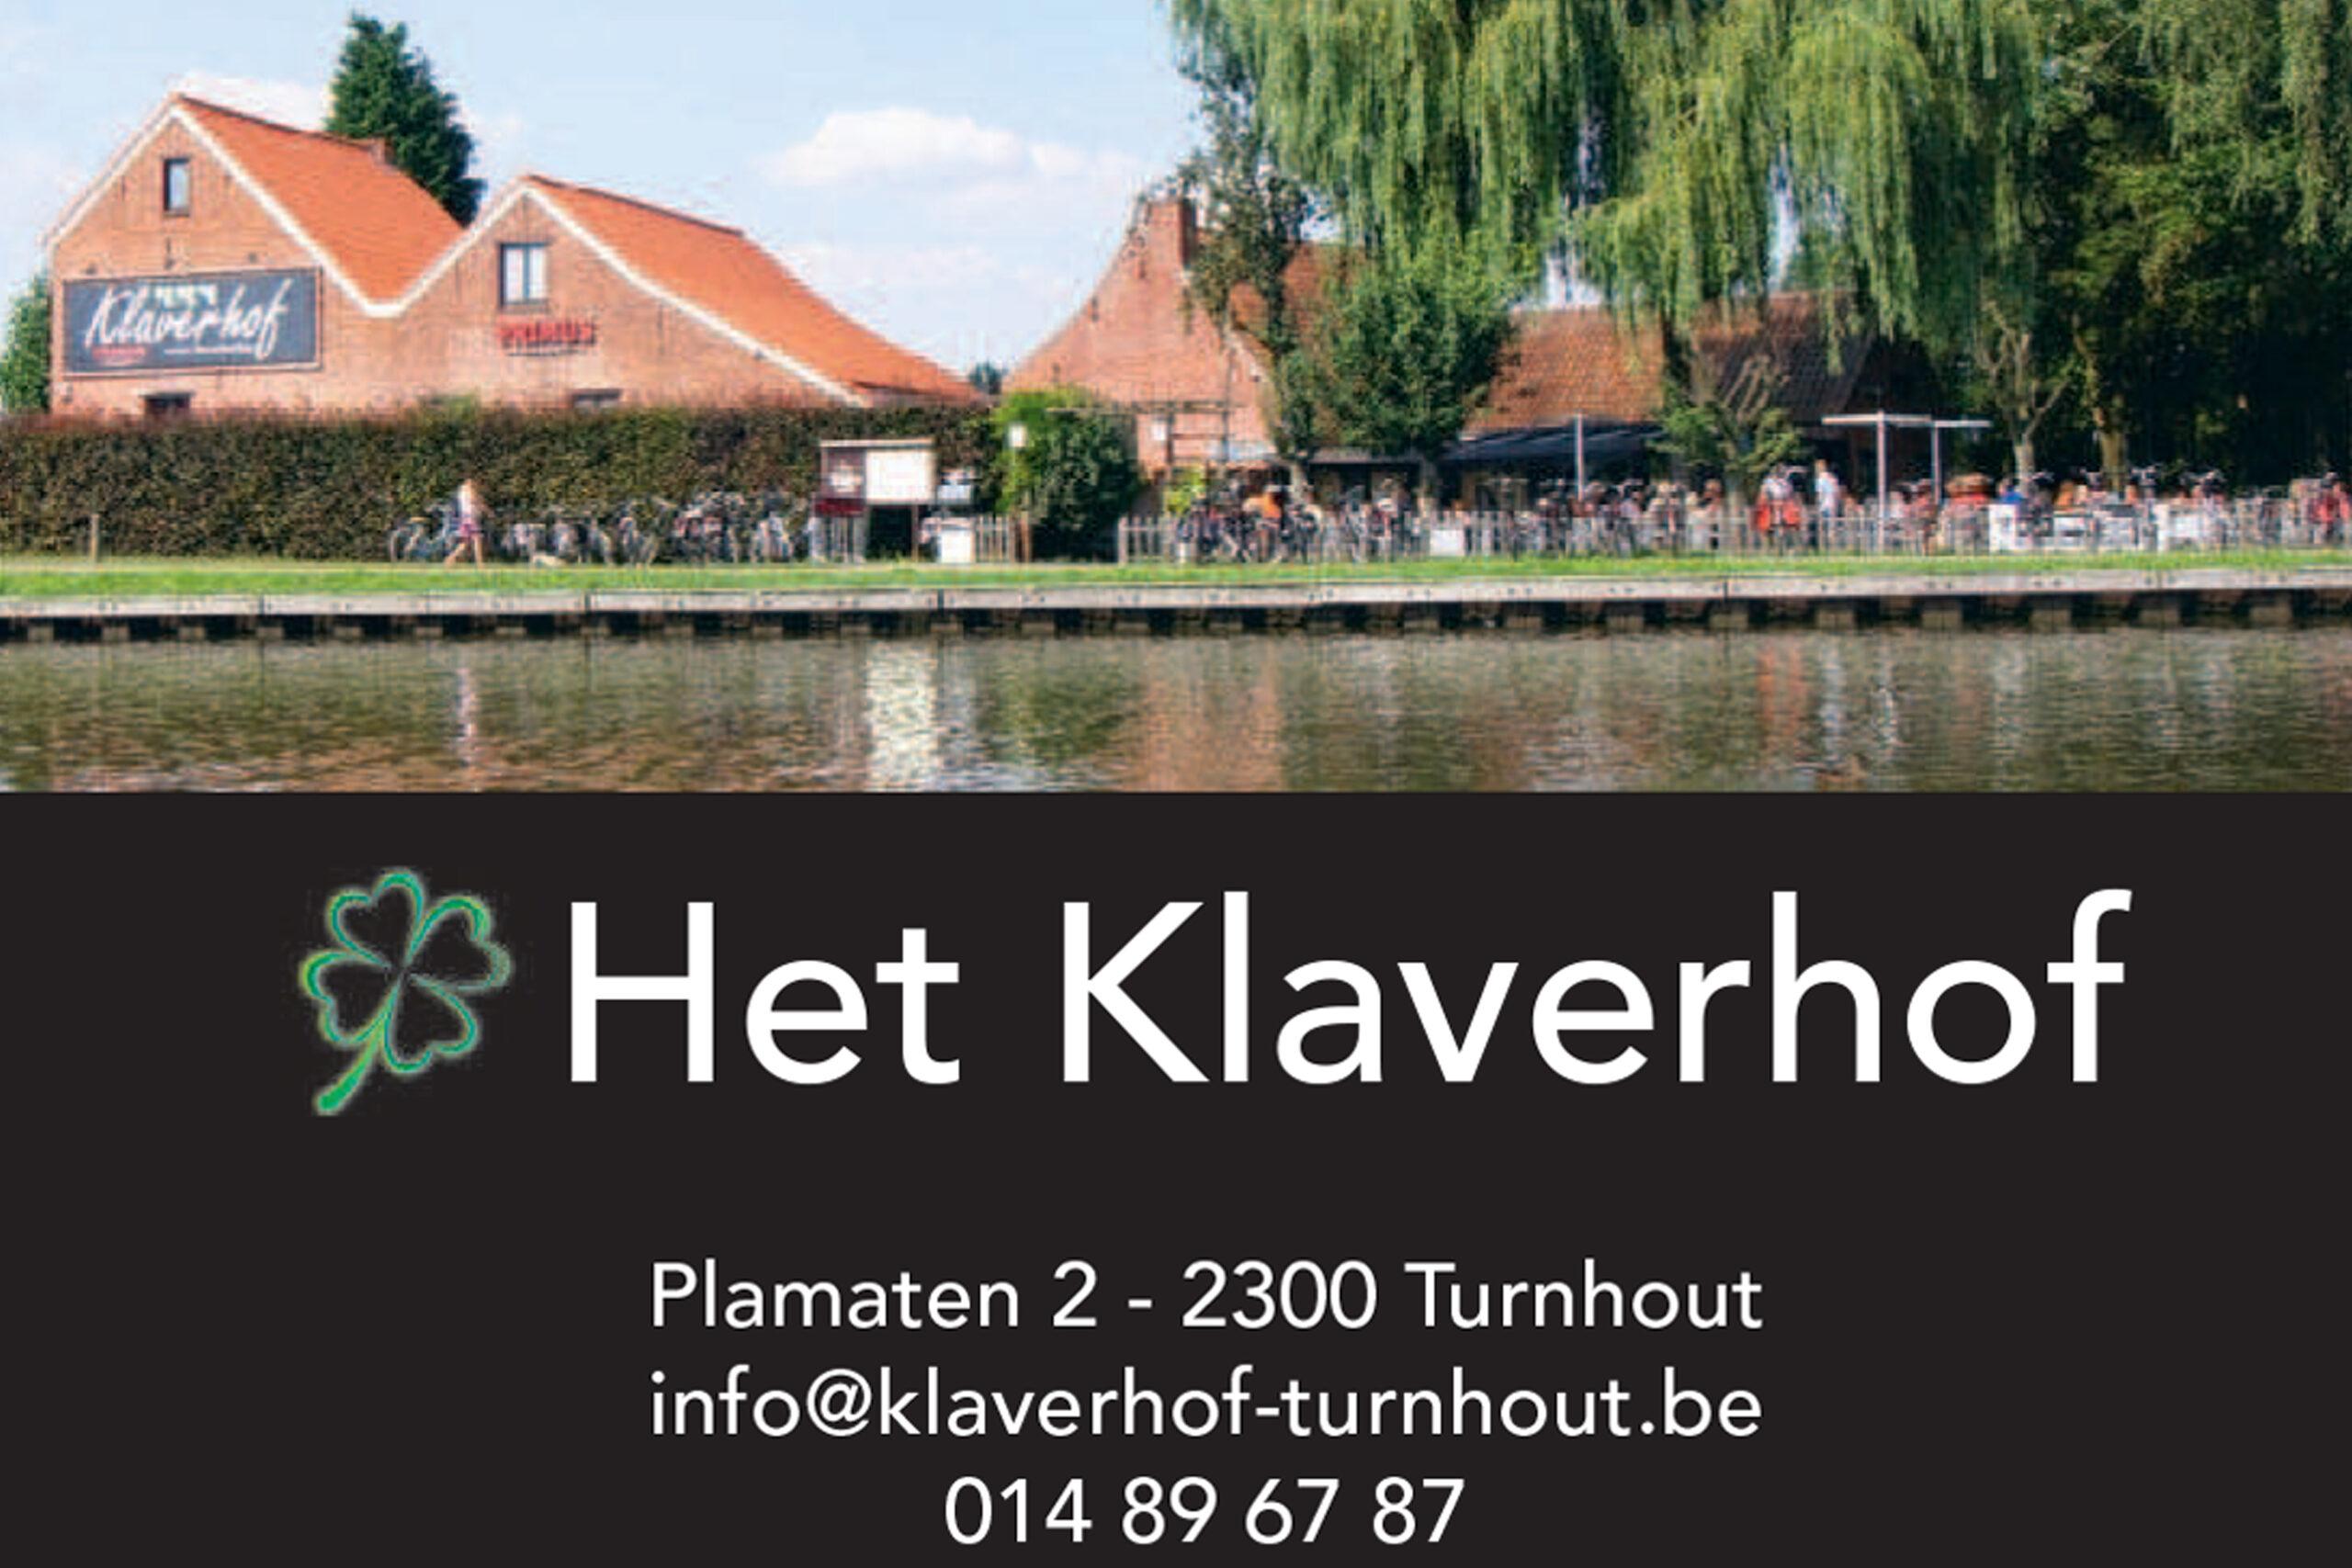 16) Klaverhof